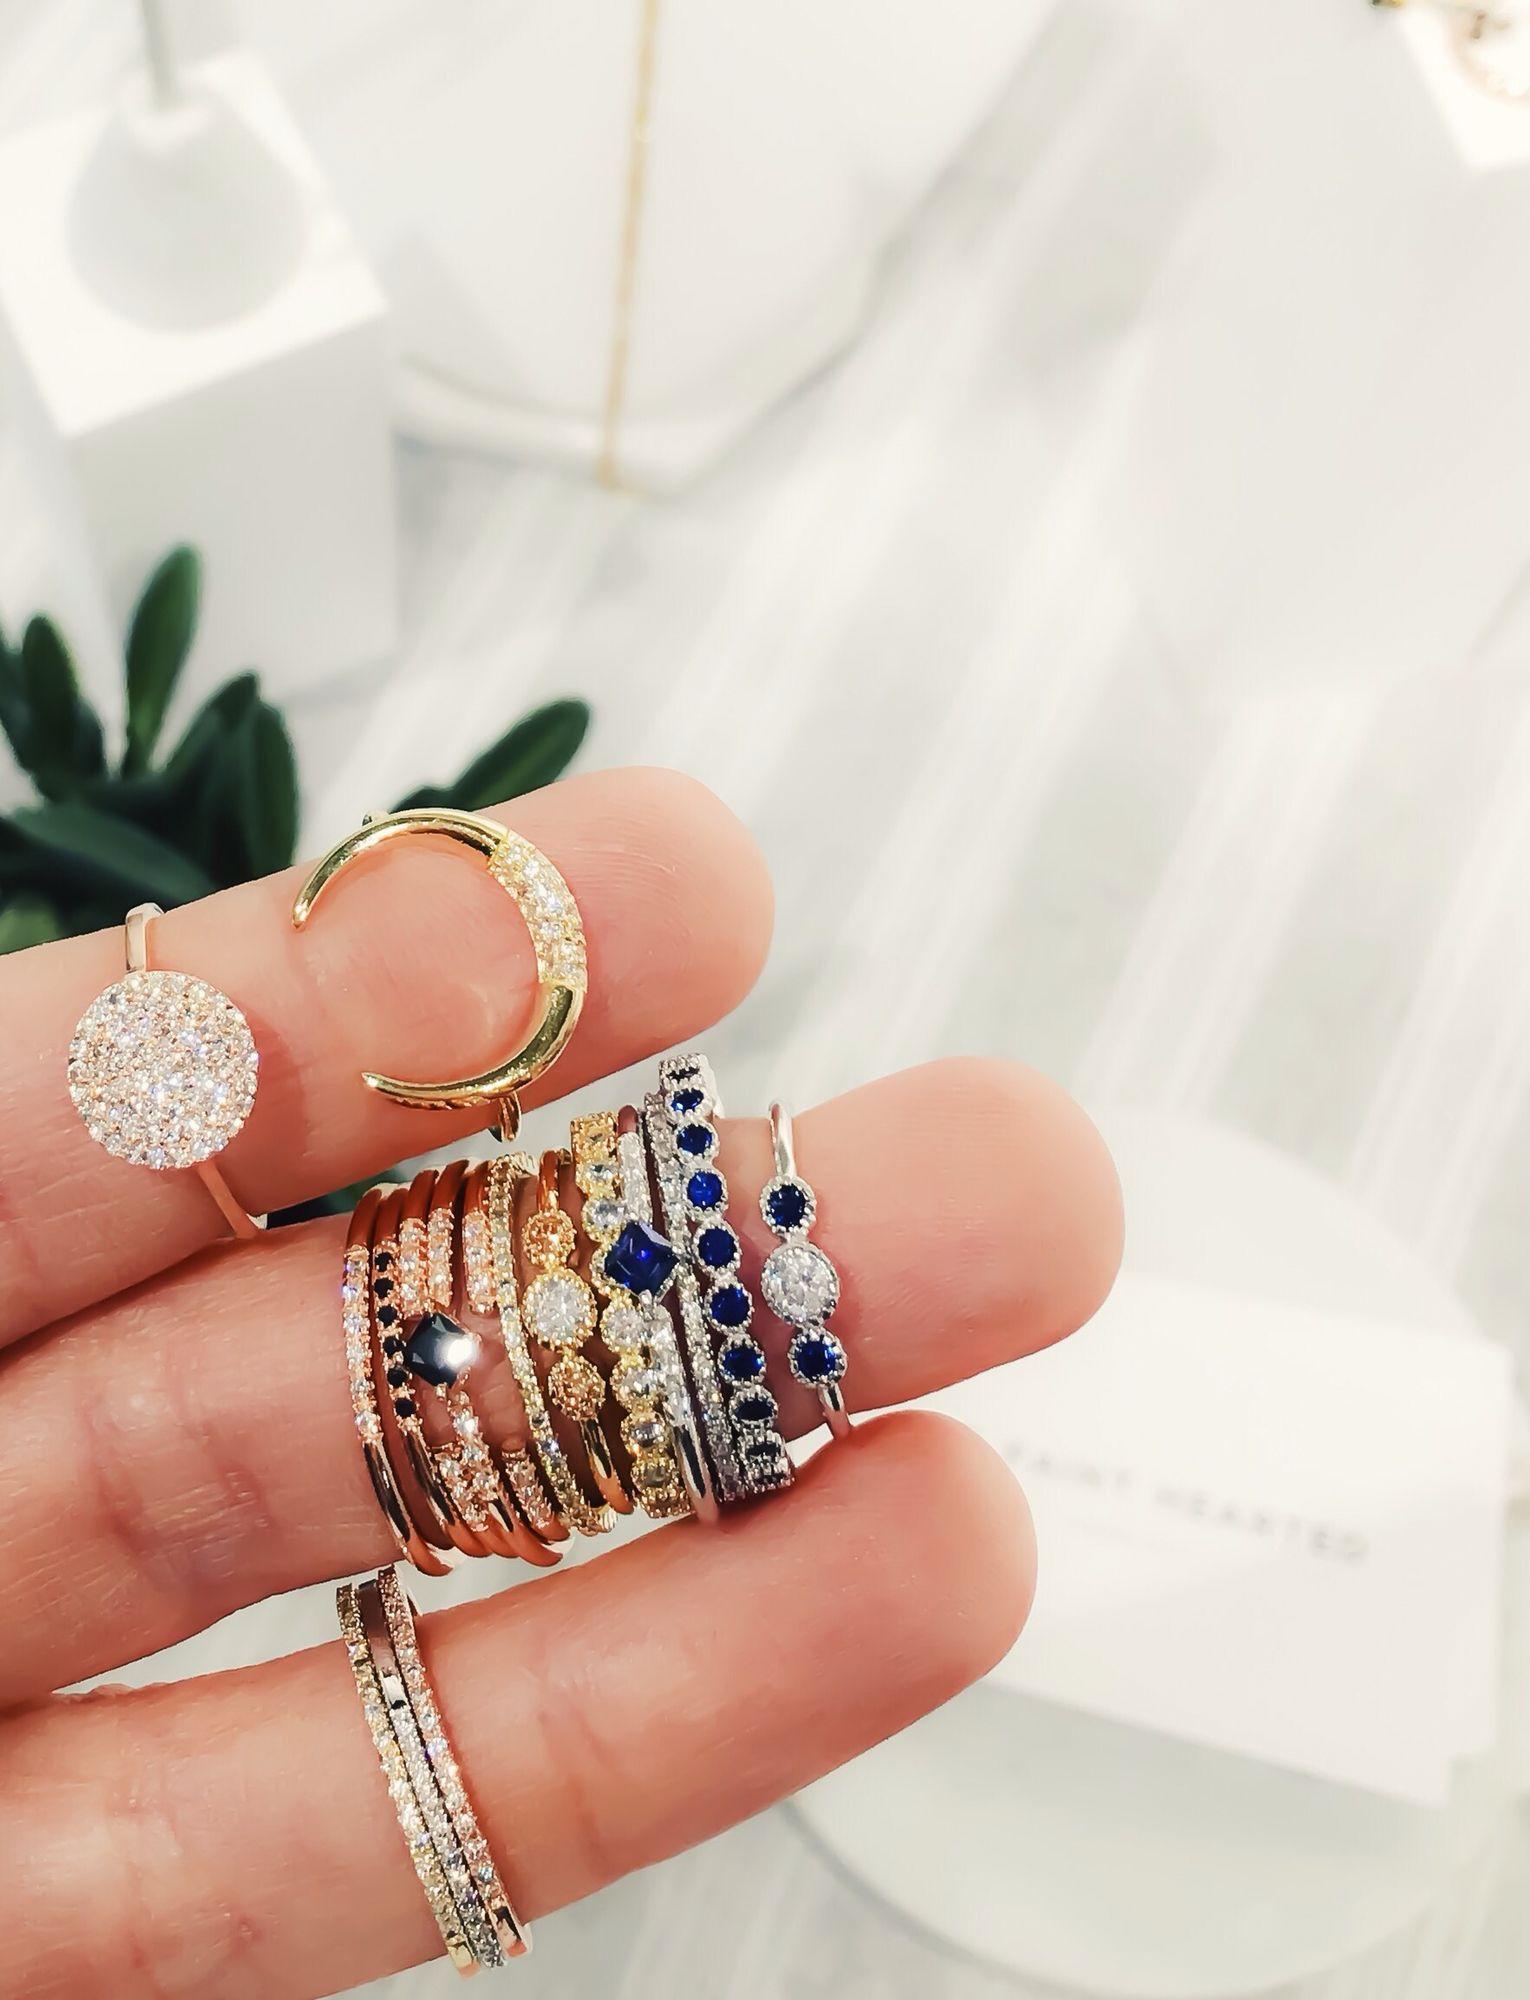 Pin van Angelina Smallwood op Rings | Pinterest - Sieraden, Juwelen ...